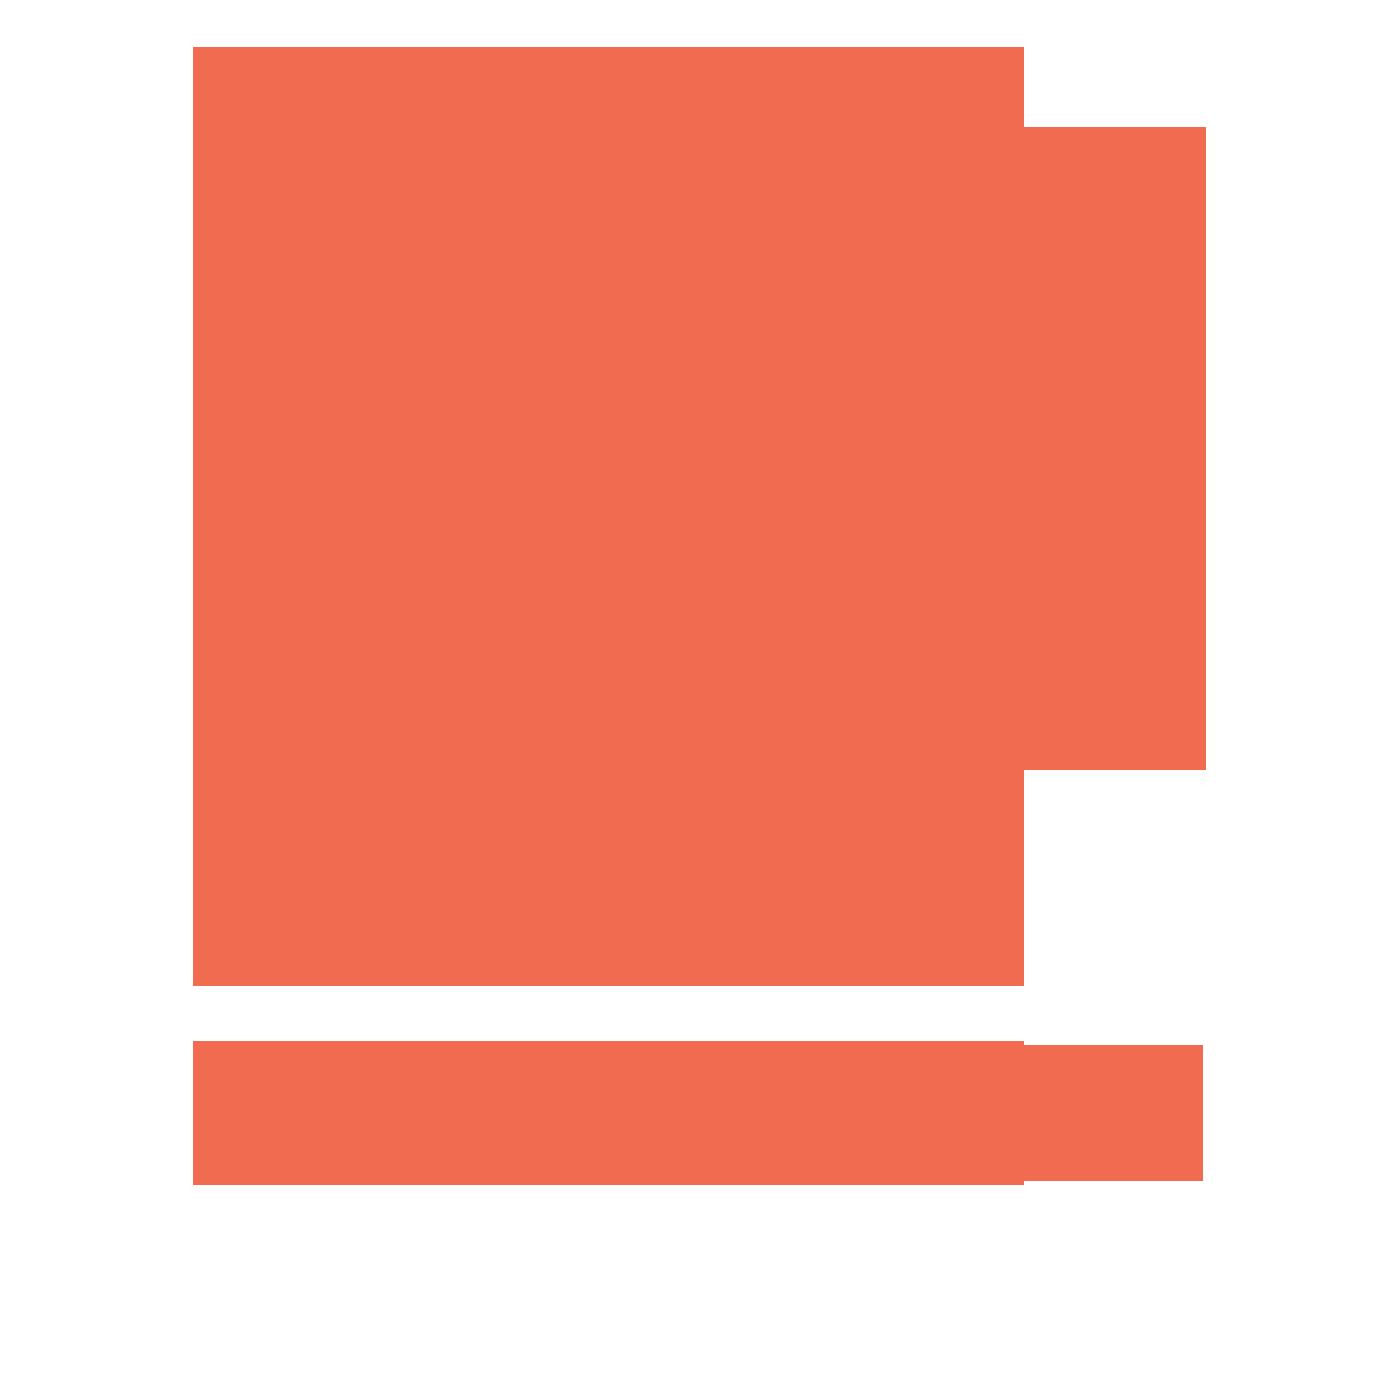 The moveSKILL podcast show art